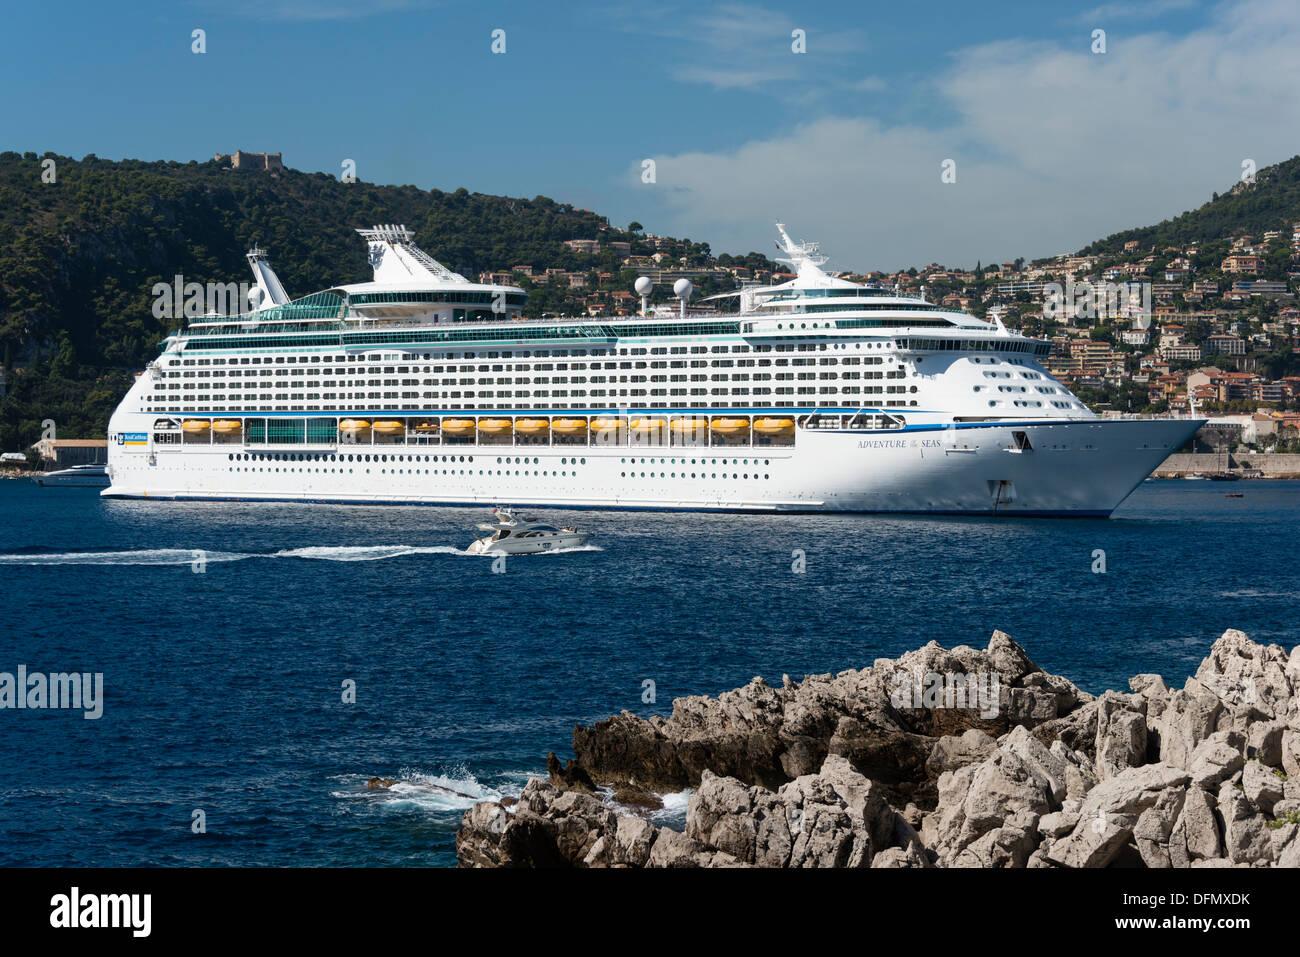 L'aventure de la mer MS Photo Stock